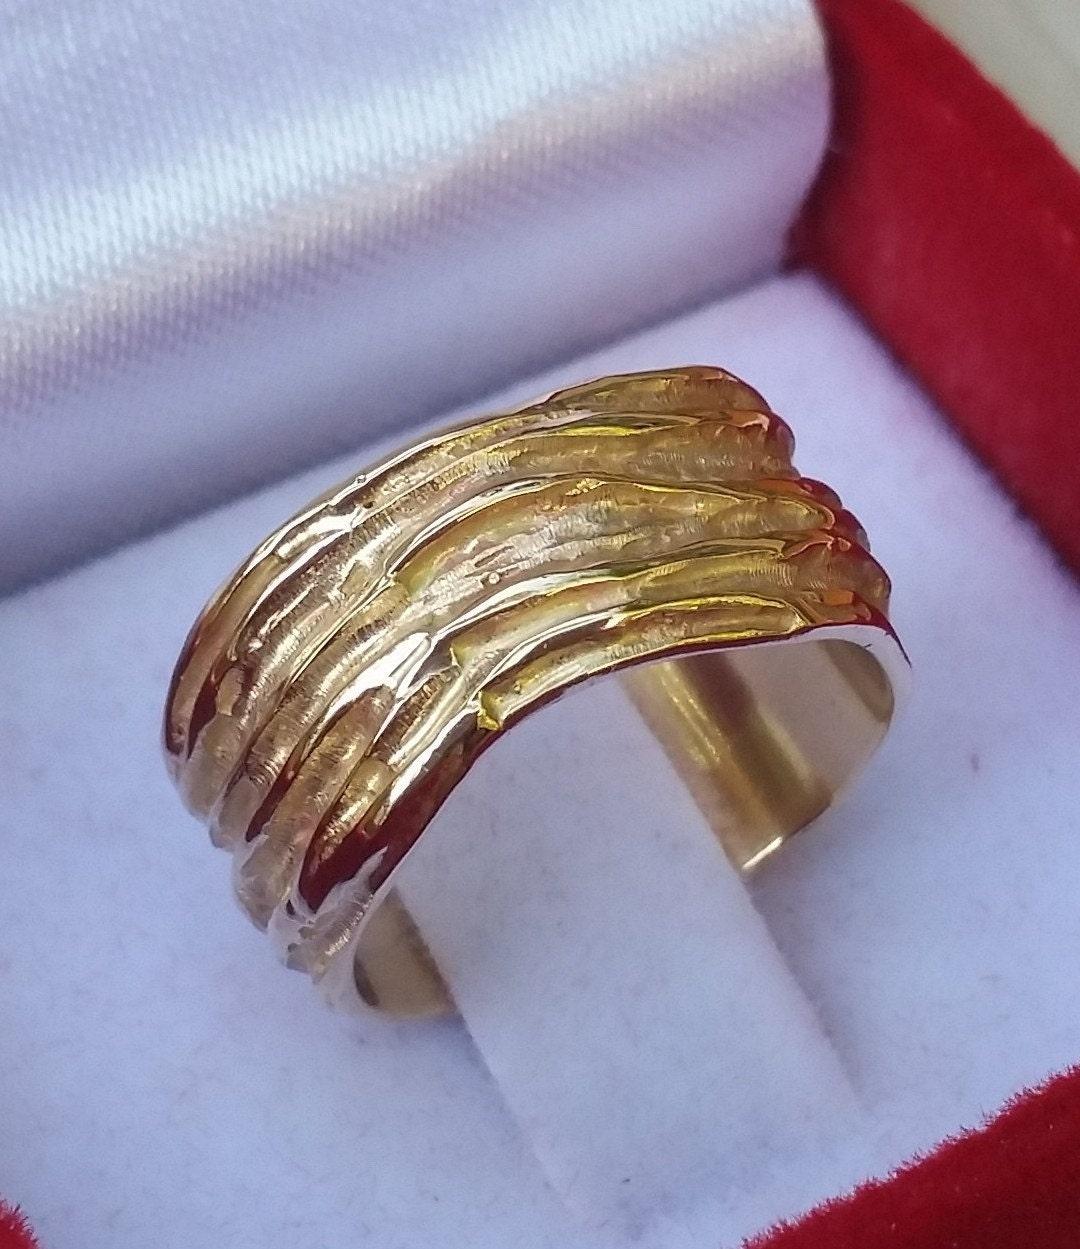 Details About Gold Wedding Band Unique Wedding Band Textured Gold Ring Unisex Gold Ring